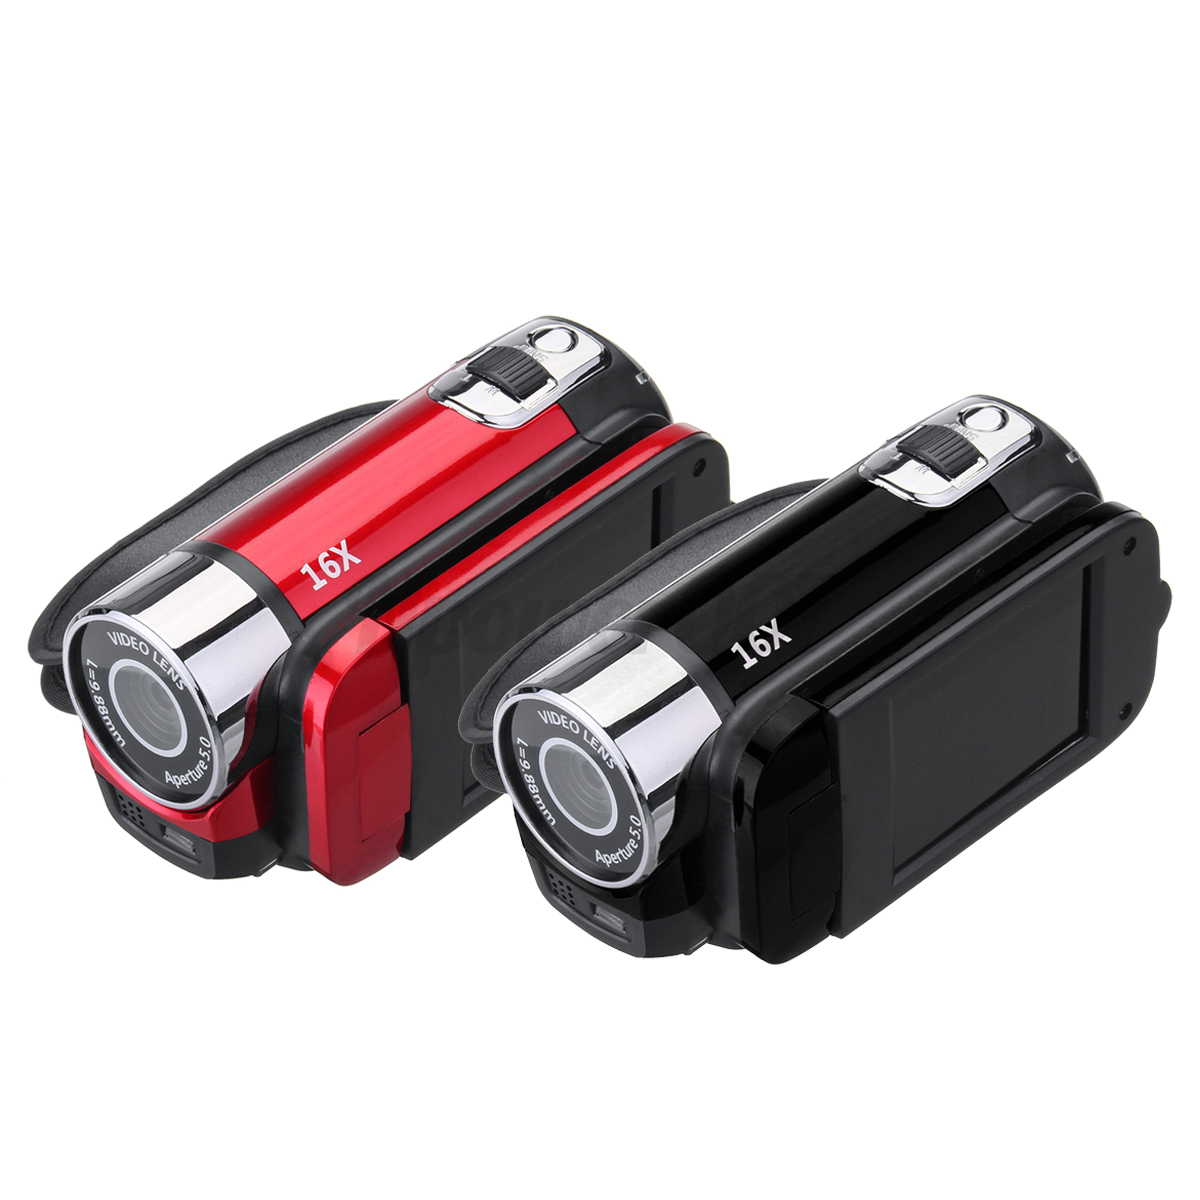 1080P-16MP-HD-LCD-FULL-16X-ZOOM-Night-Vision-Digital-Video-DV-Camera-Camcorder